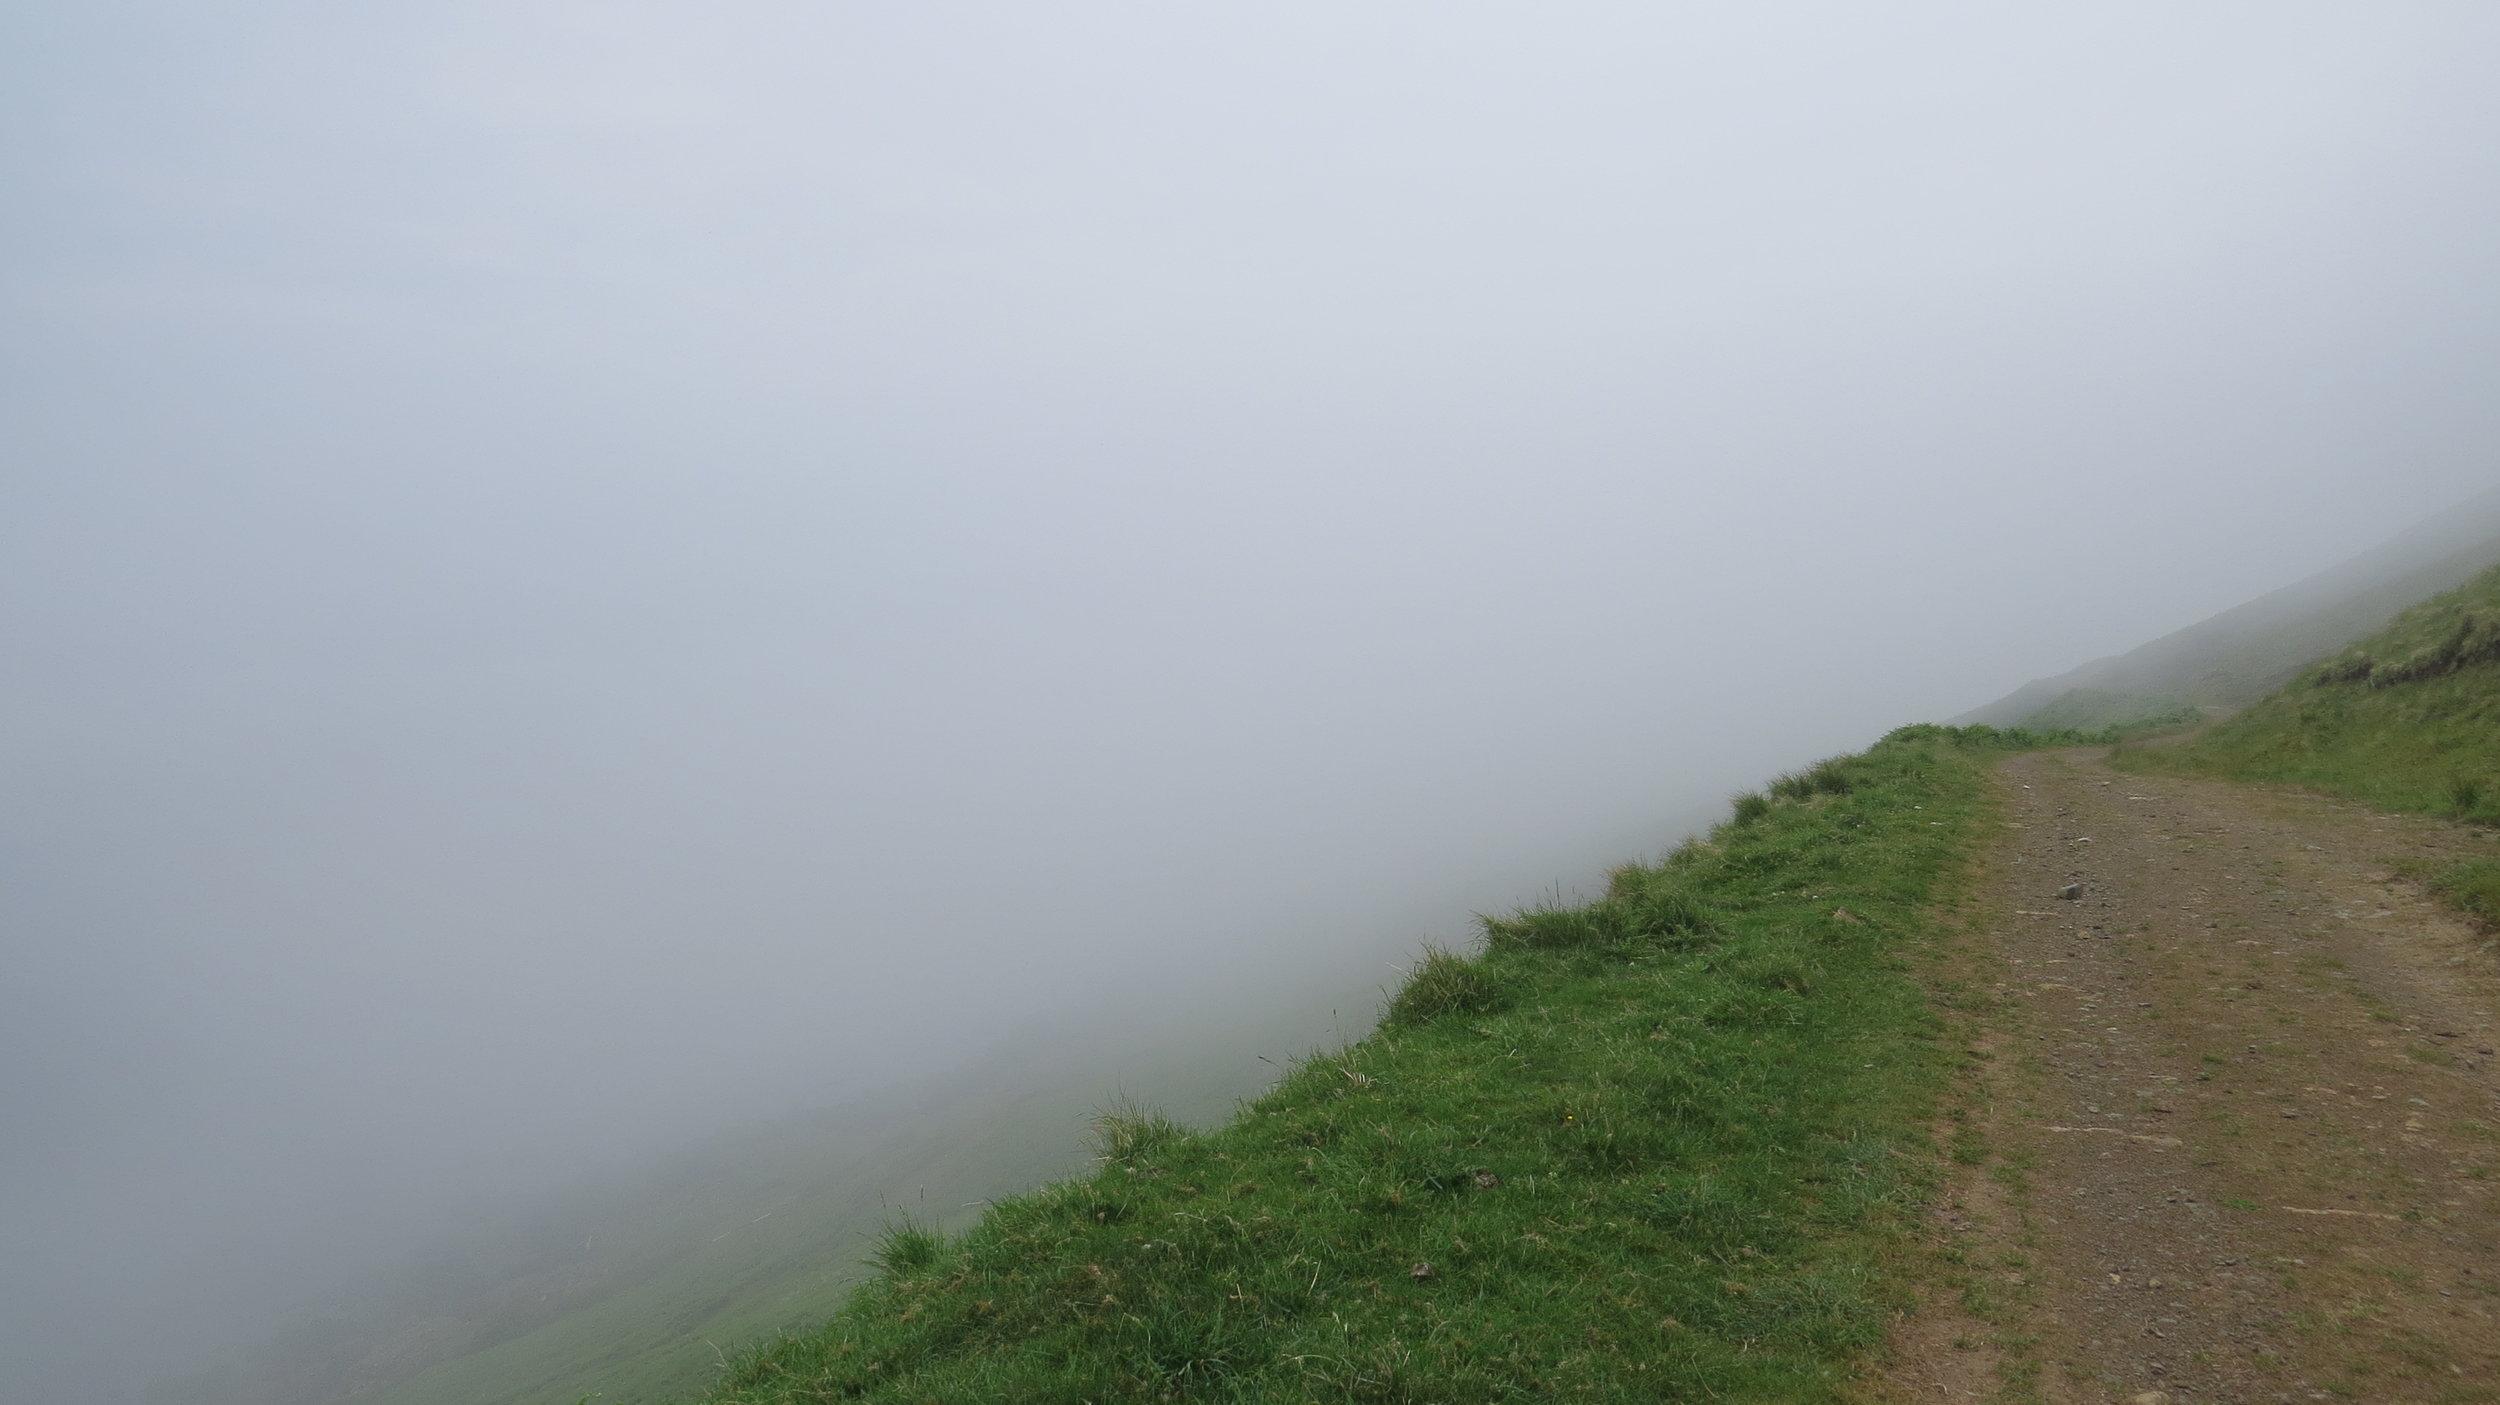 Haze Increases as I Climb